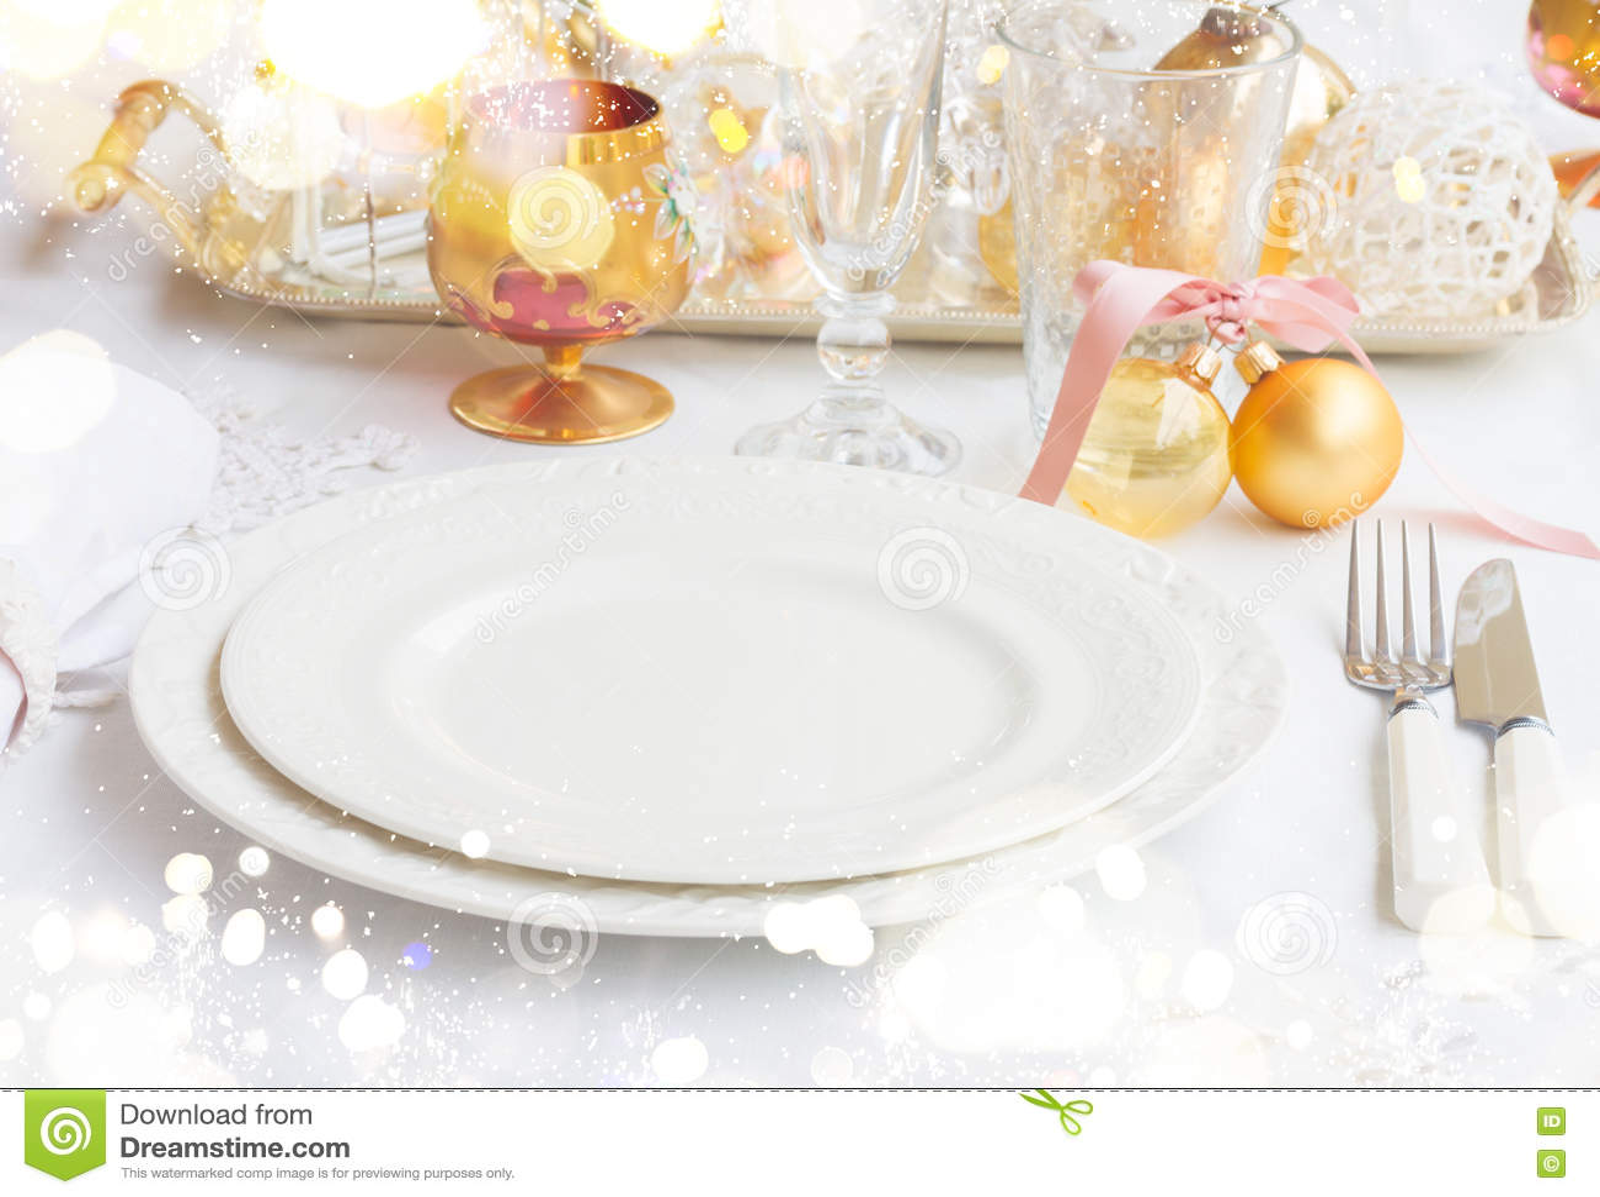 Christmas Tableware Set Stock Photo Image Of Holiday 80550896